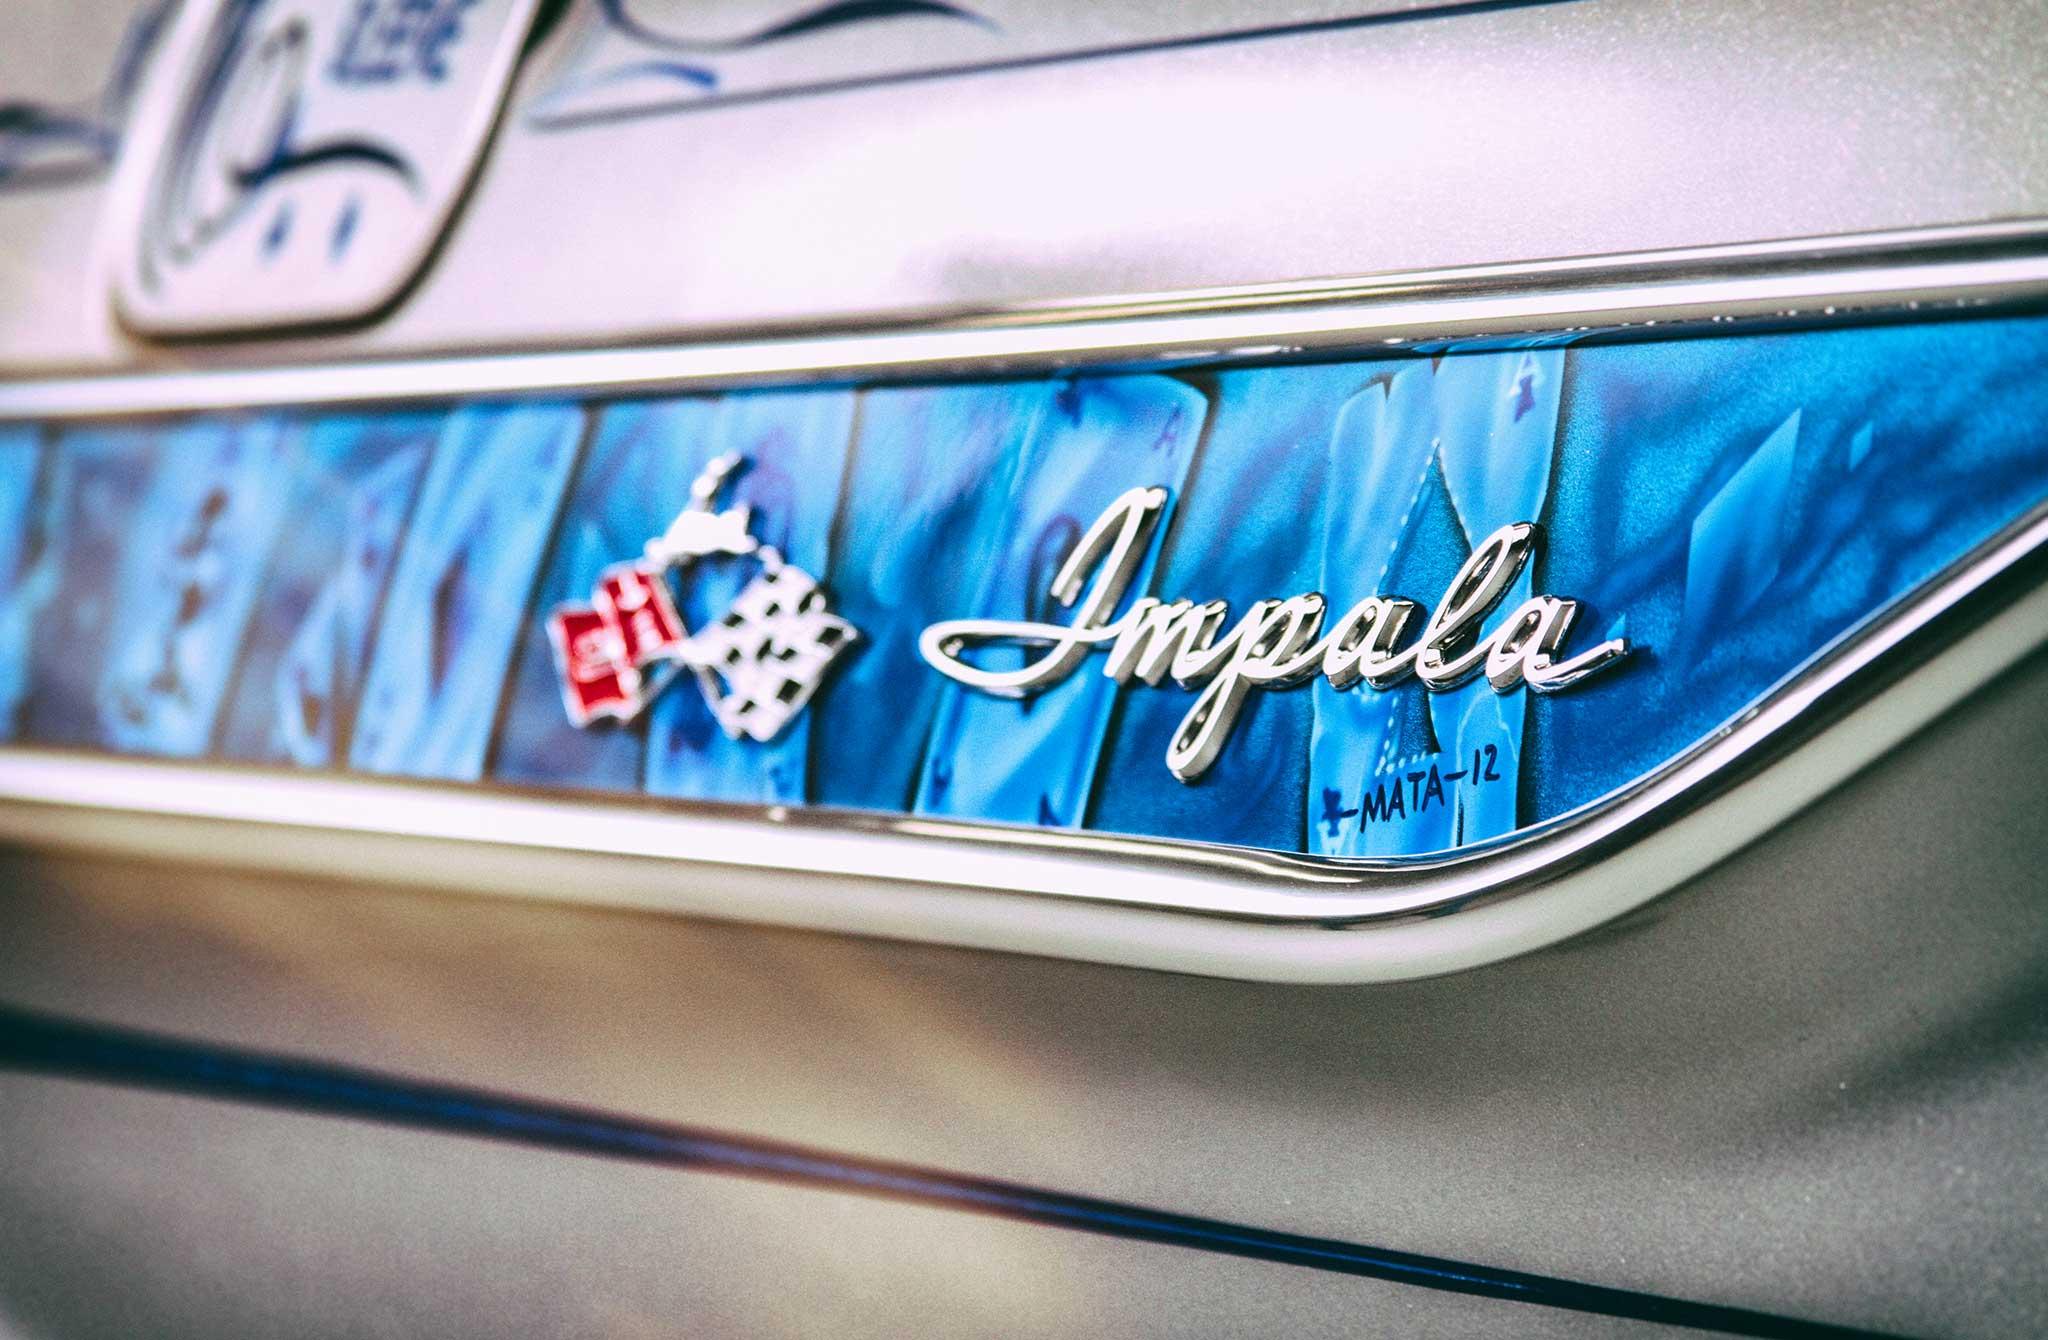 1961 chevrolet impala convertible side quarter panel badge 009